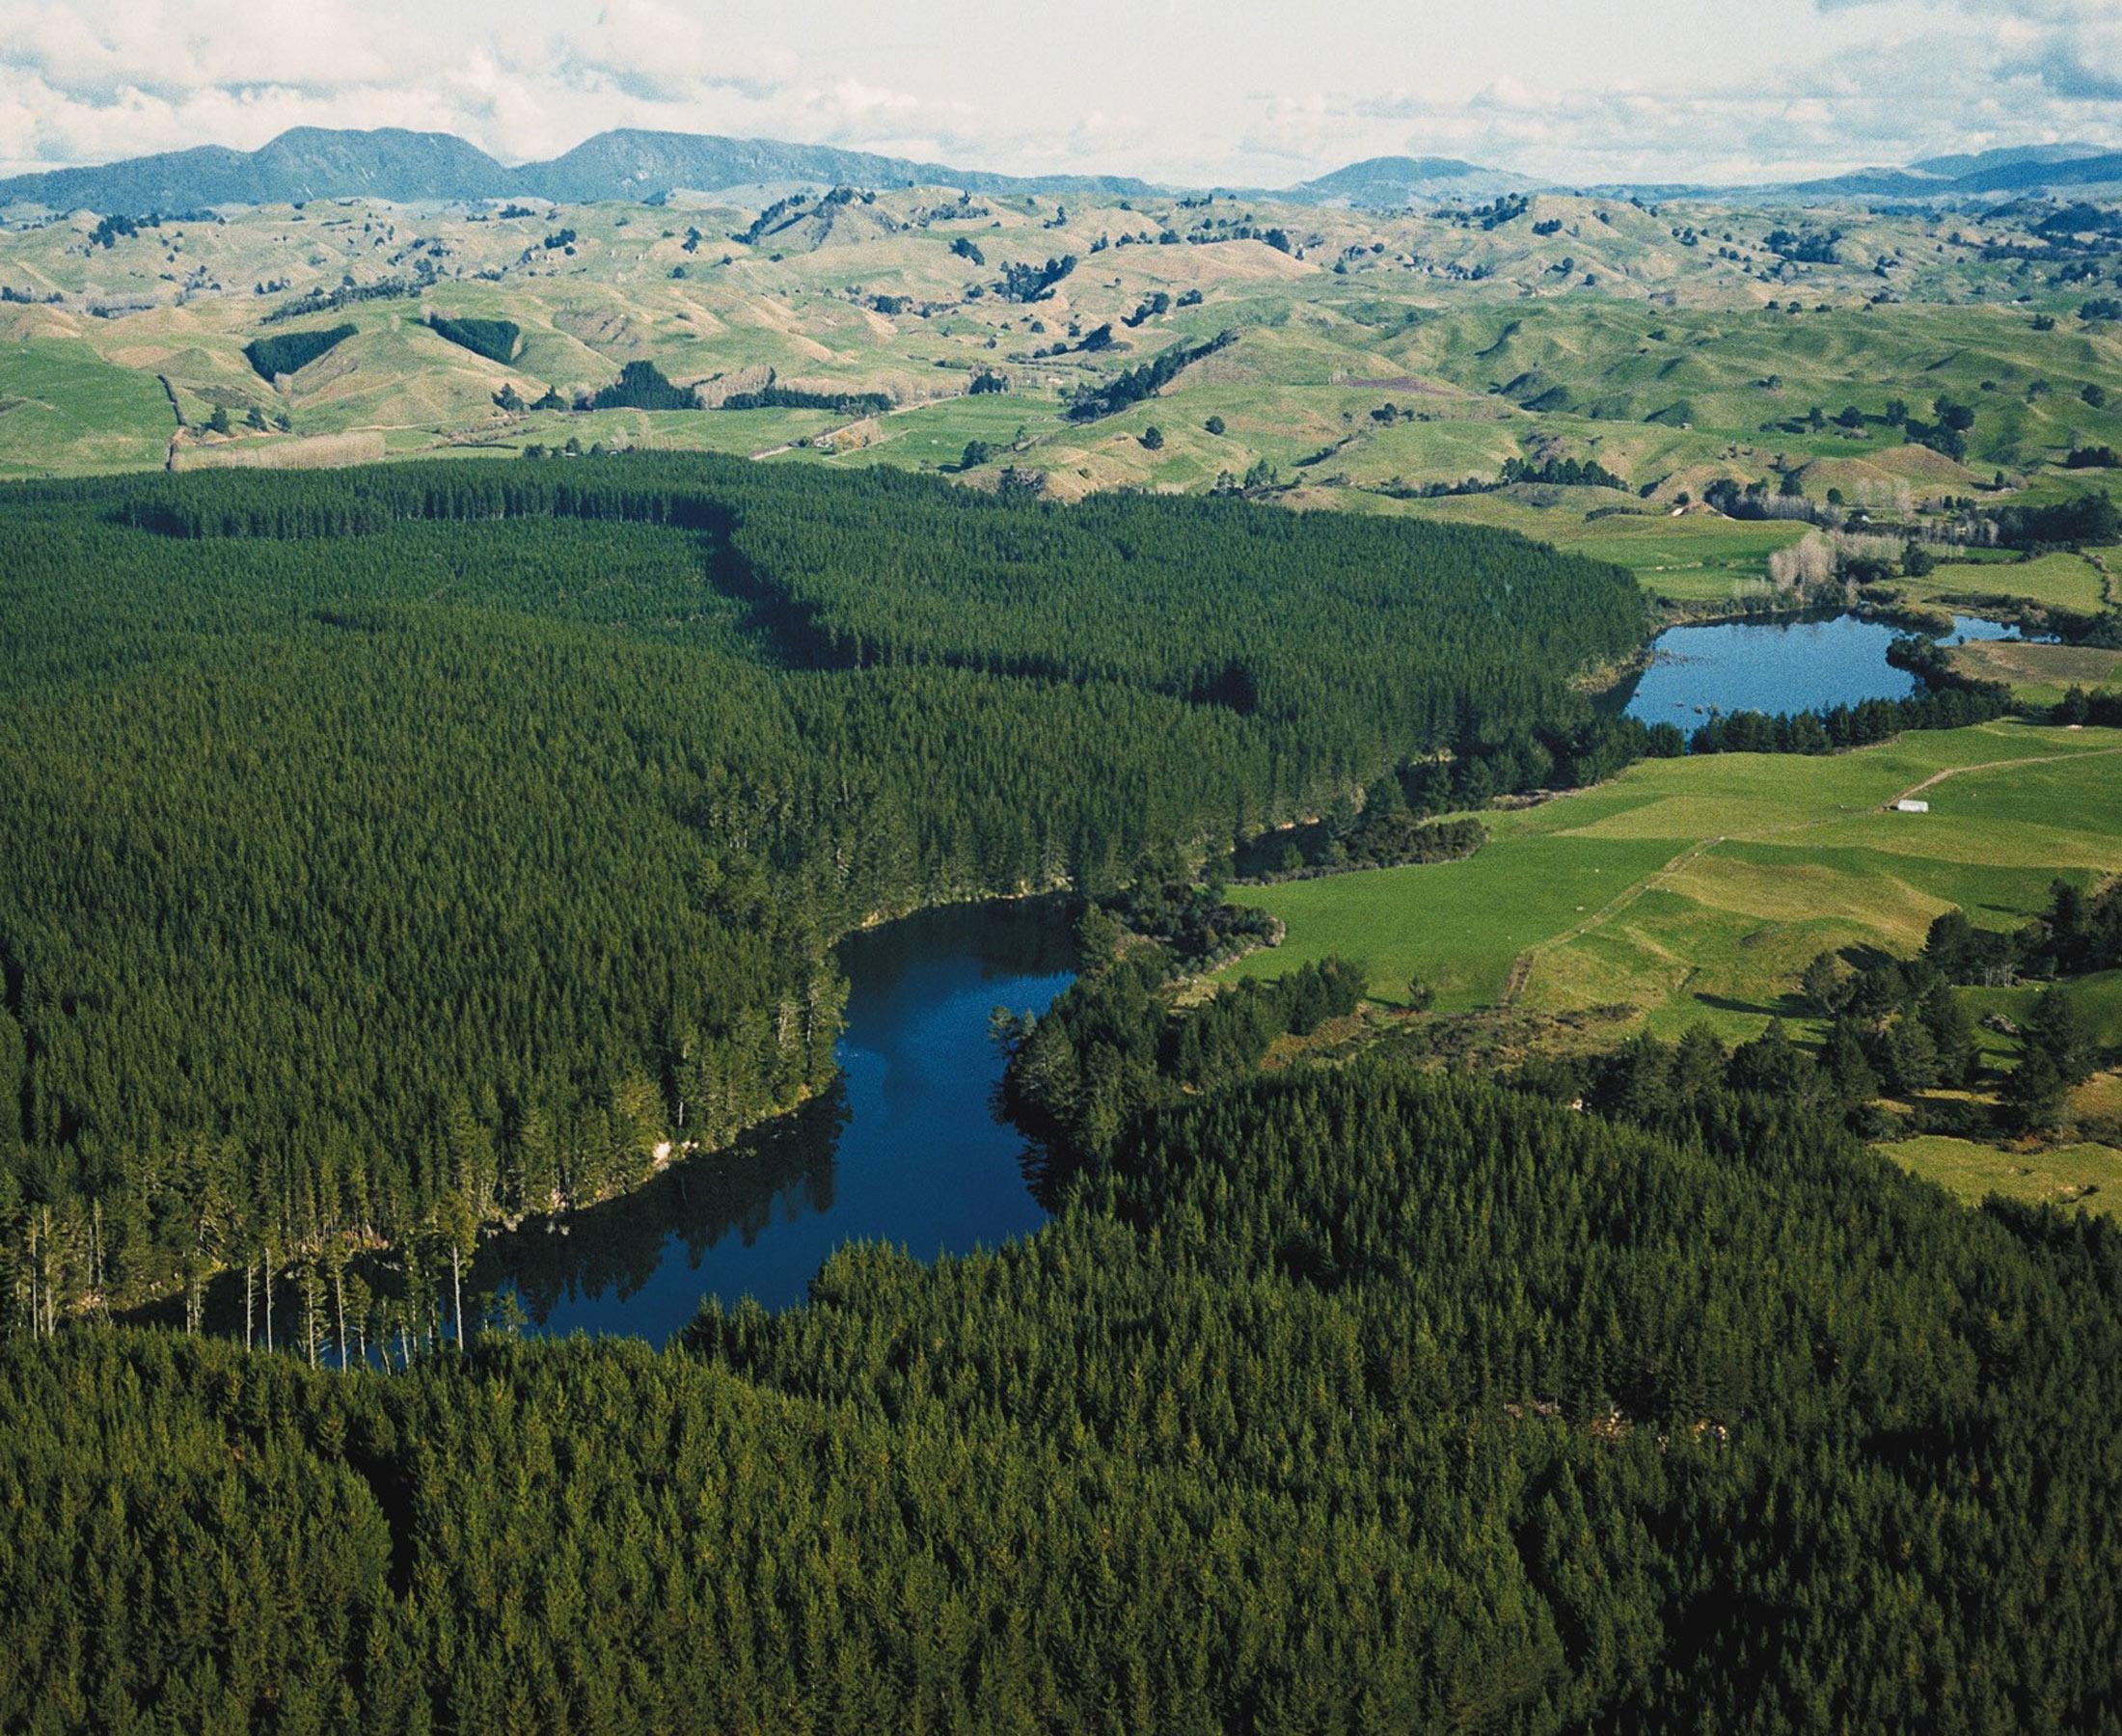 Radiata forest